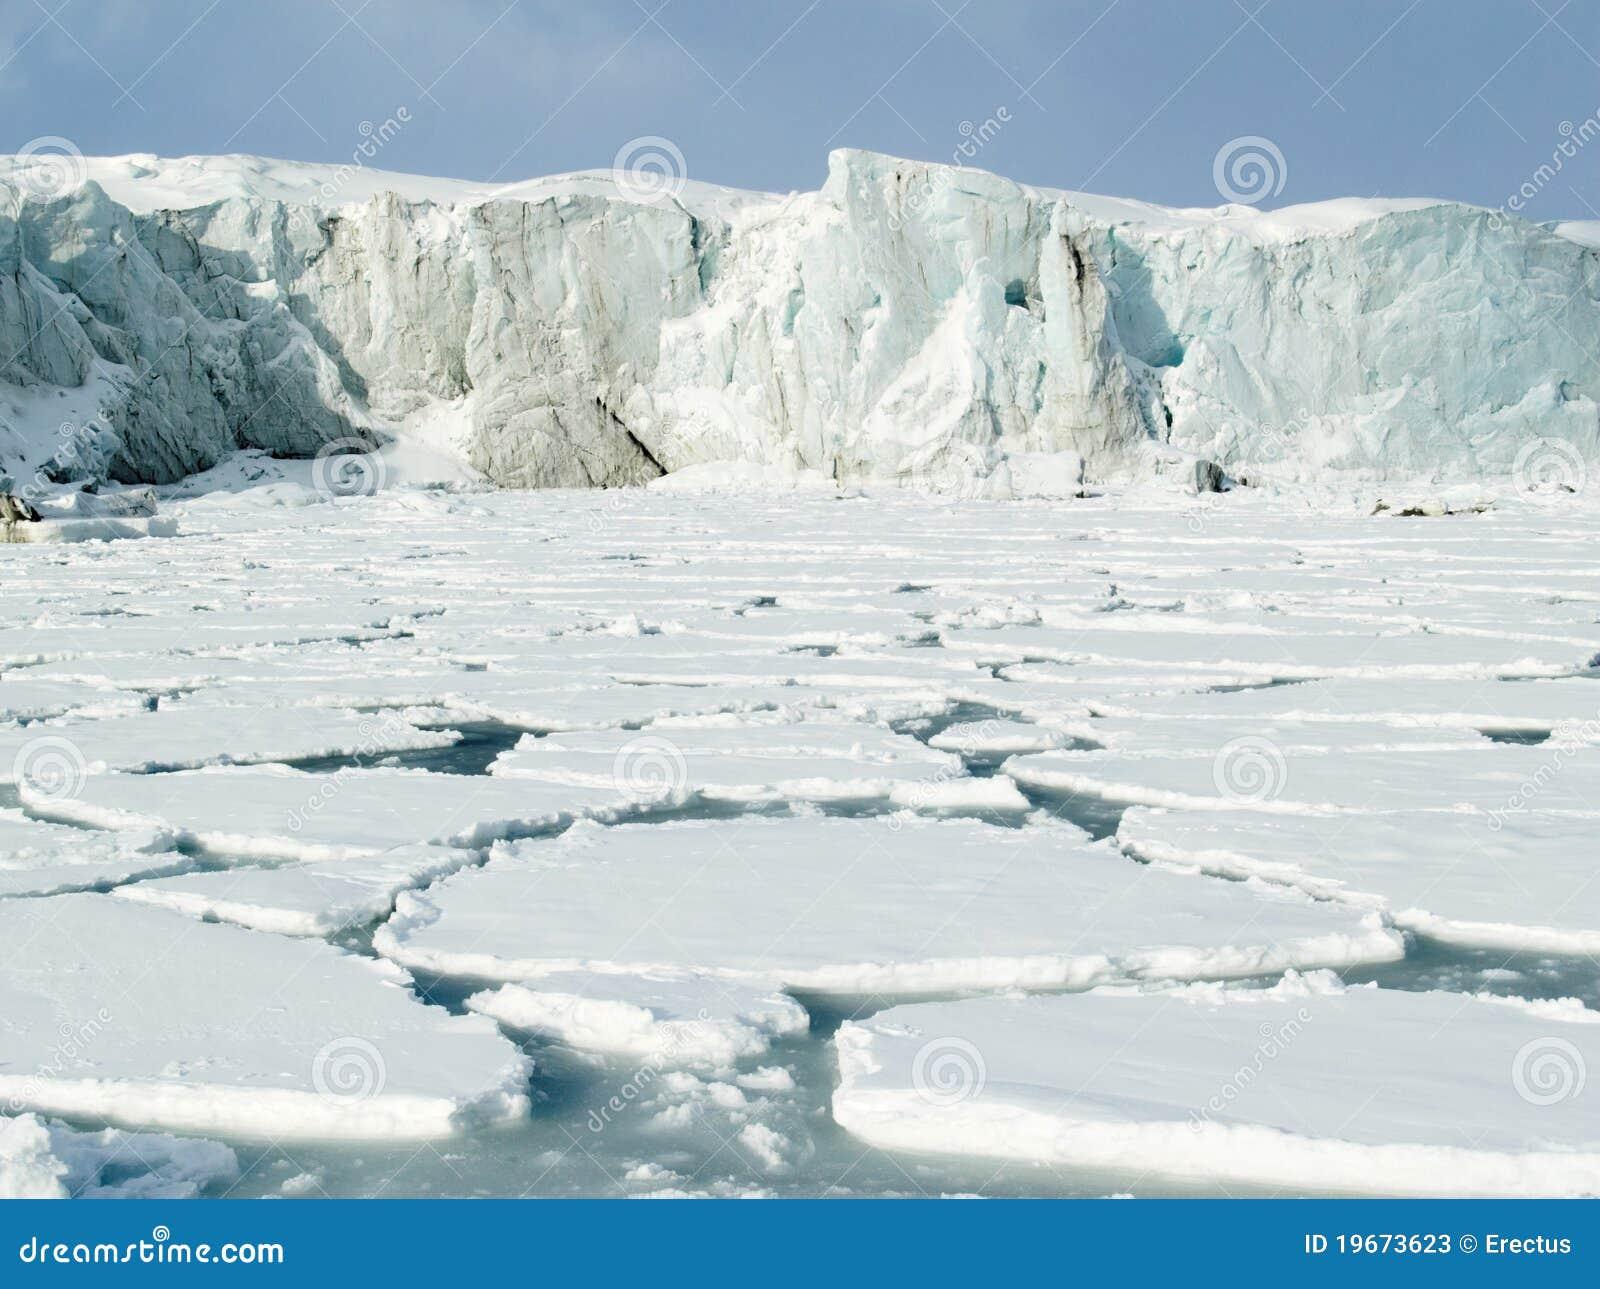 Blue Glacier Management Group 27